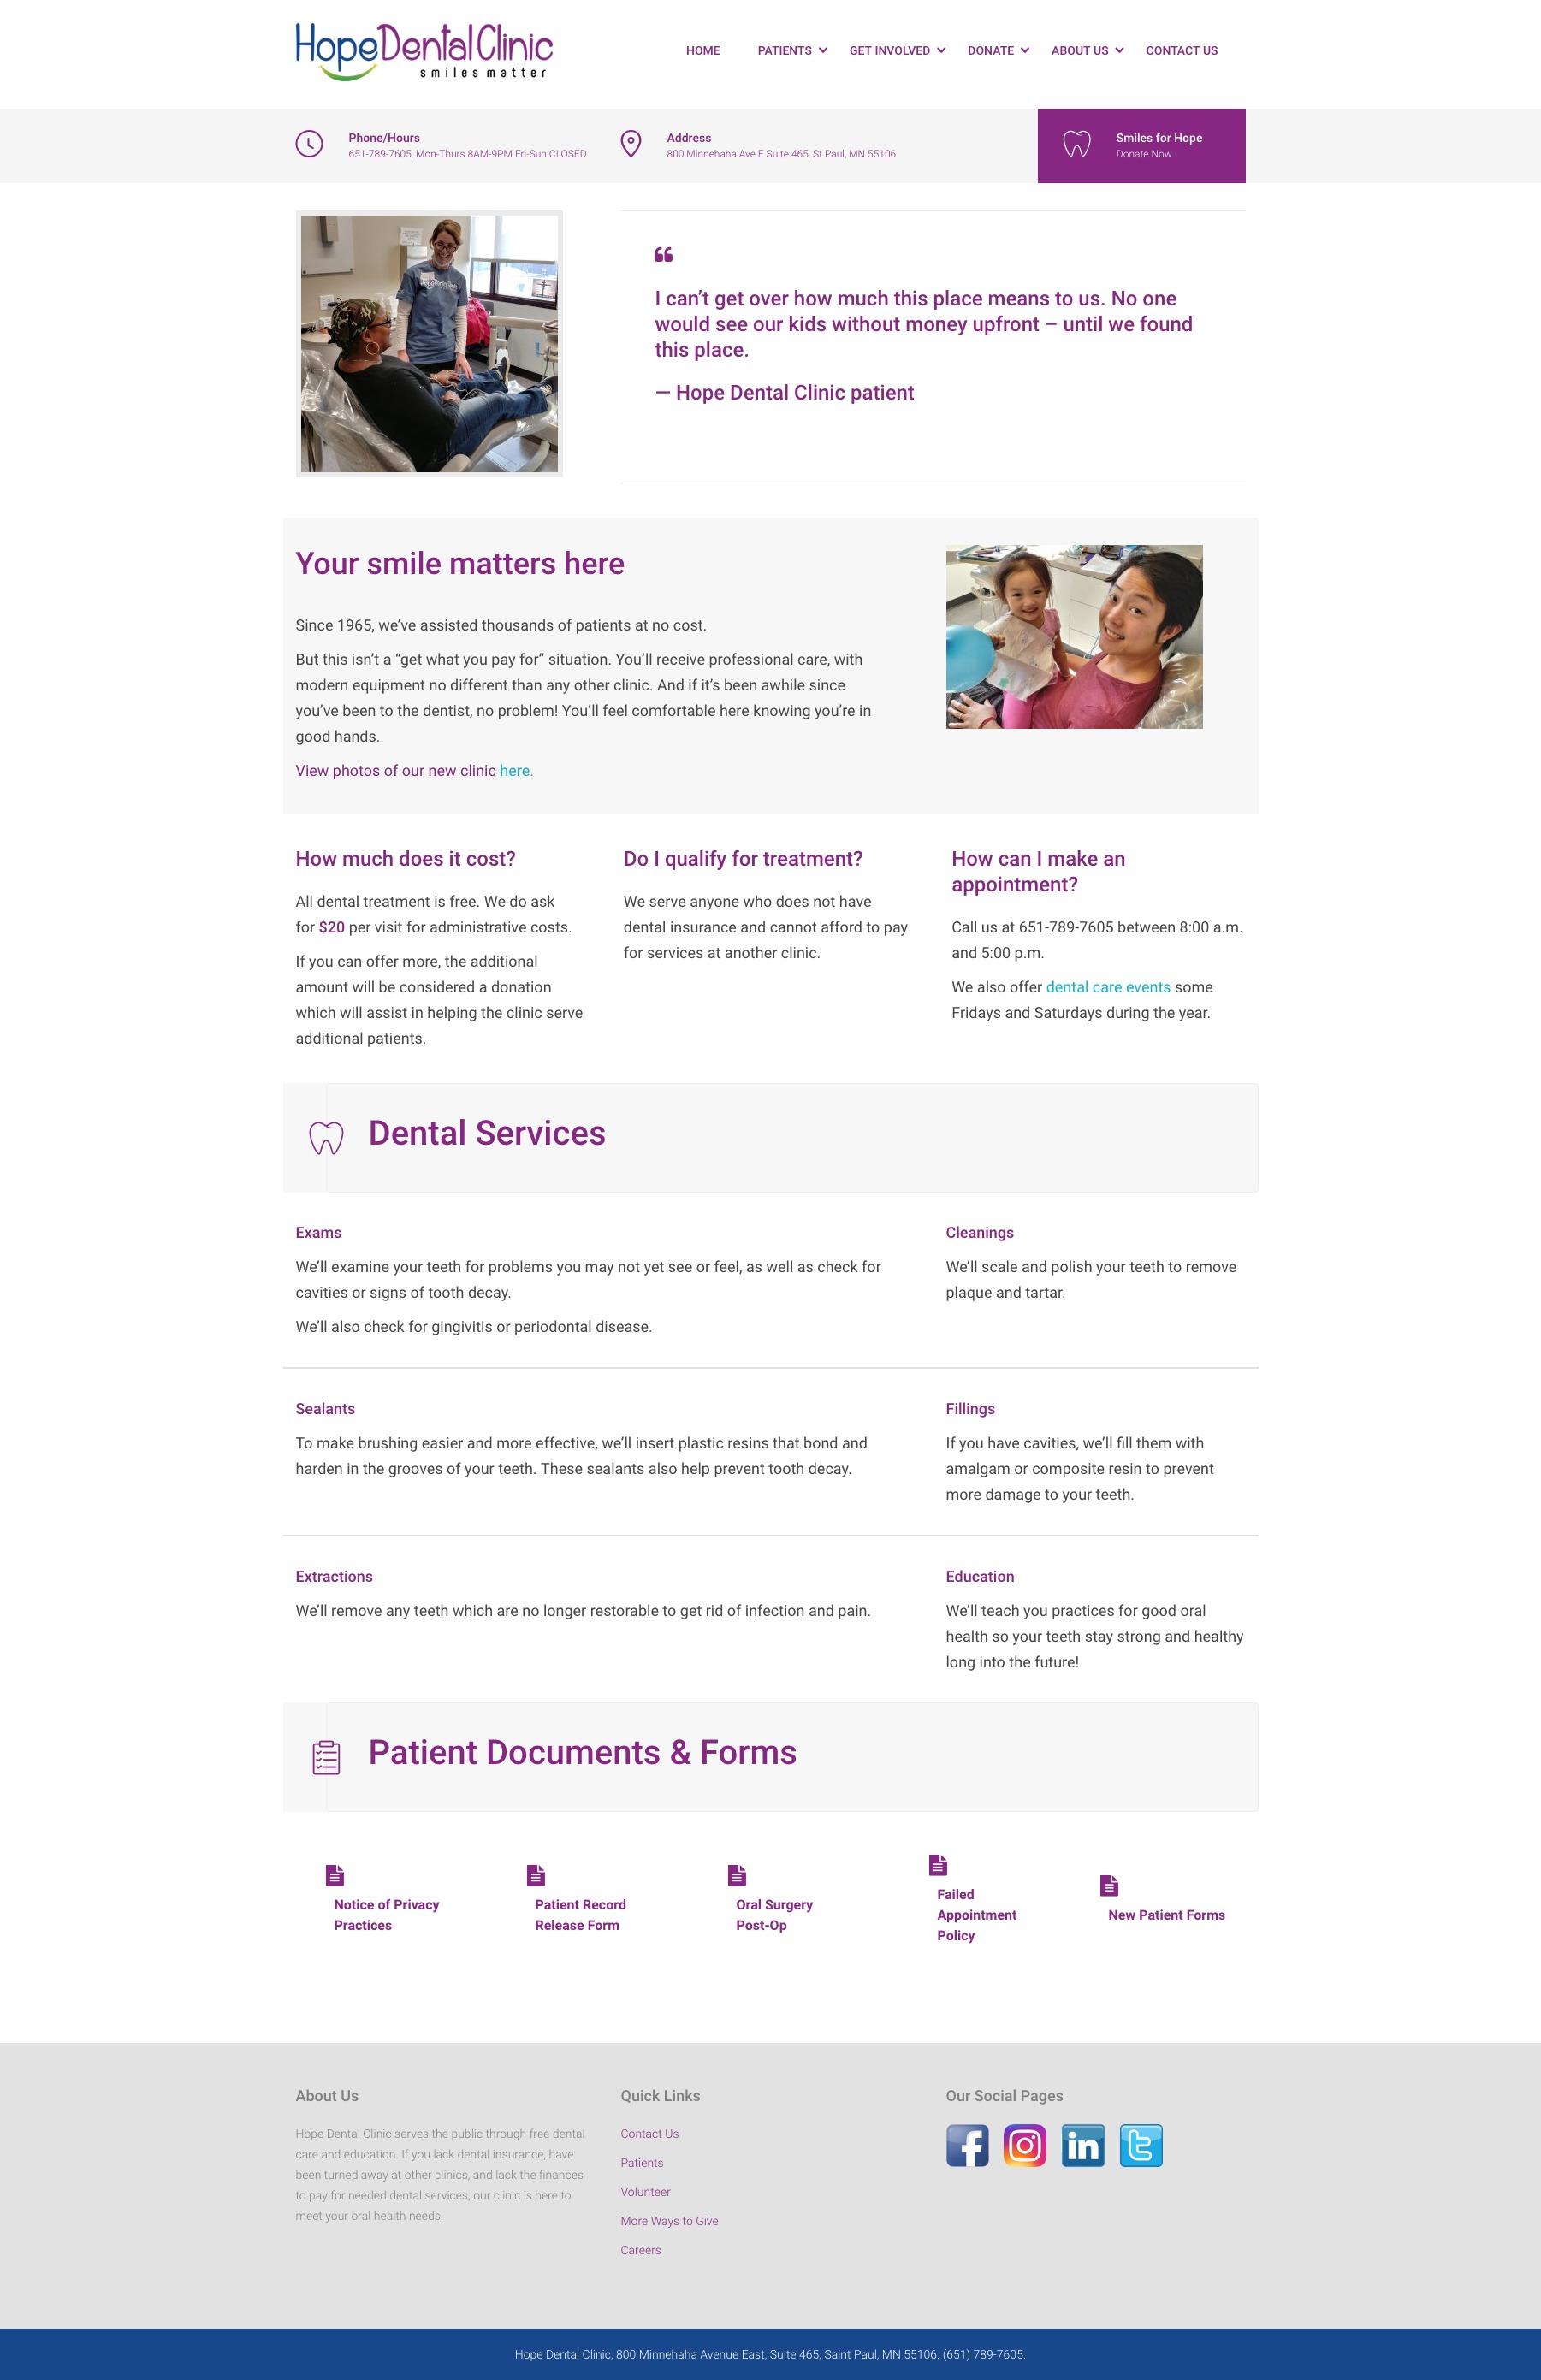 screencapture-hopedentalclinic-org-patients-2019-01-28-12_39_12.jpg